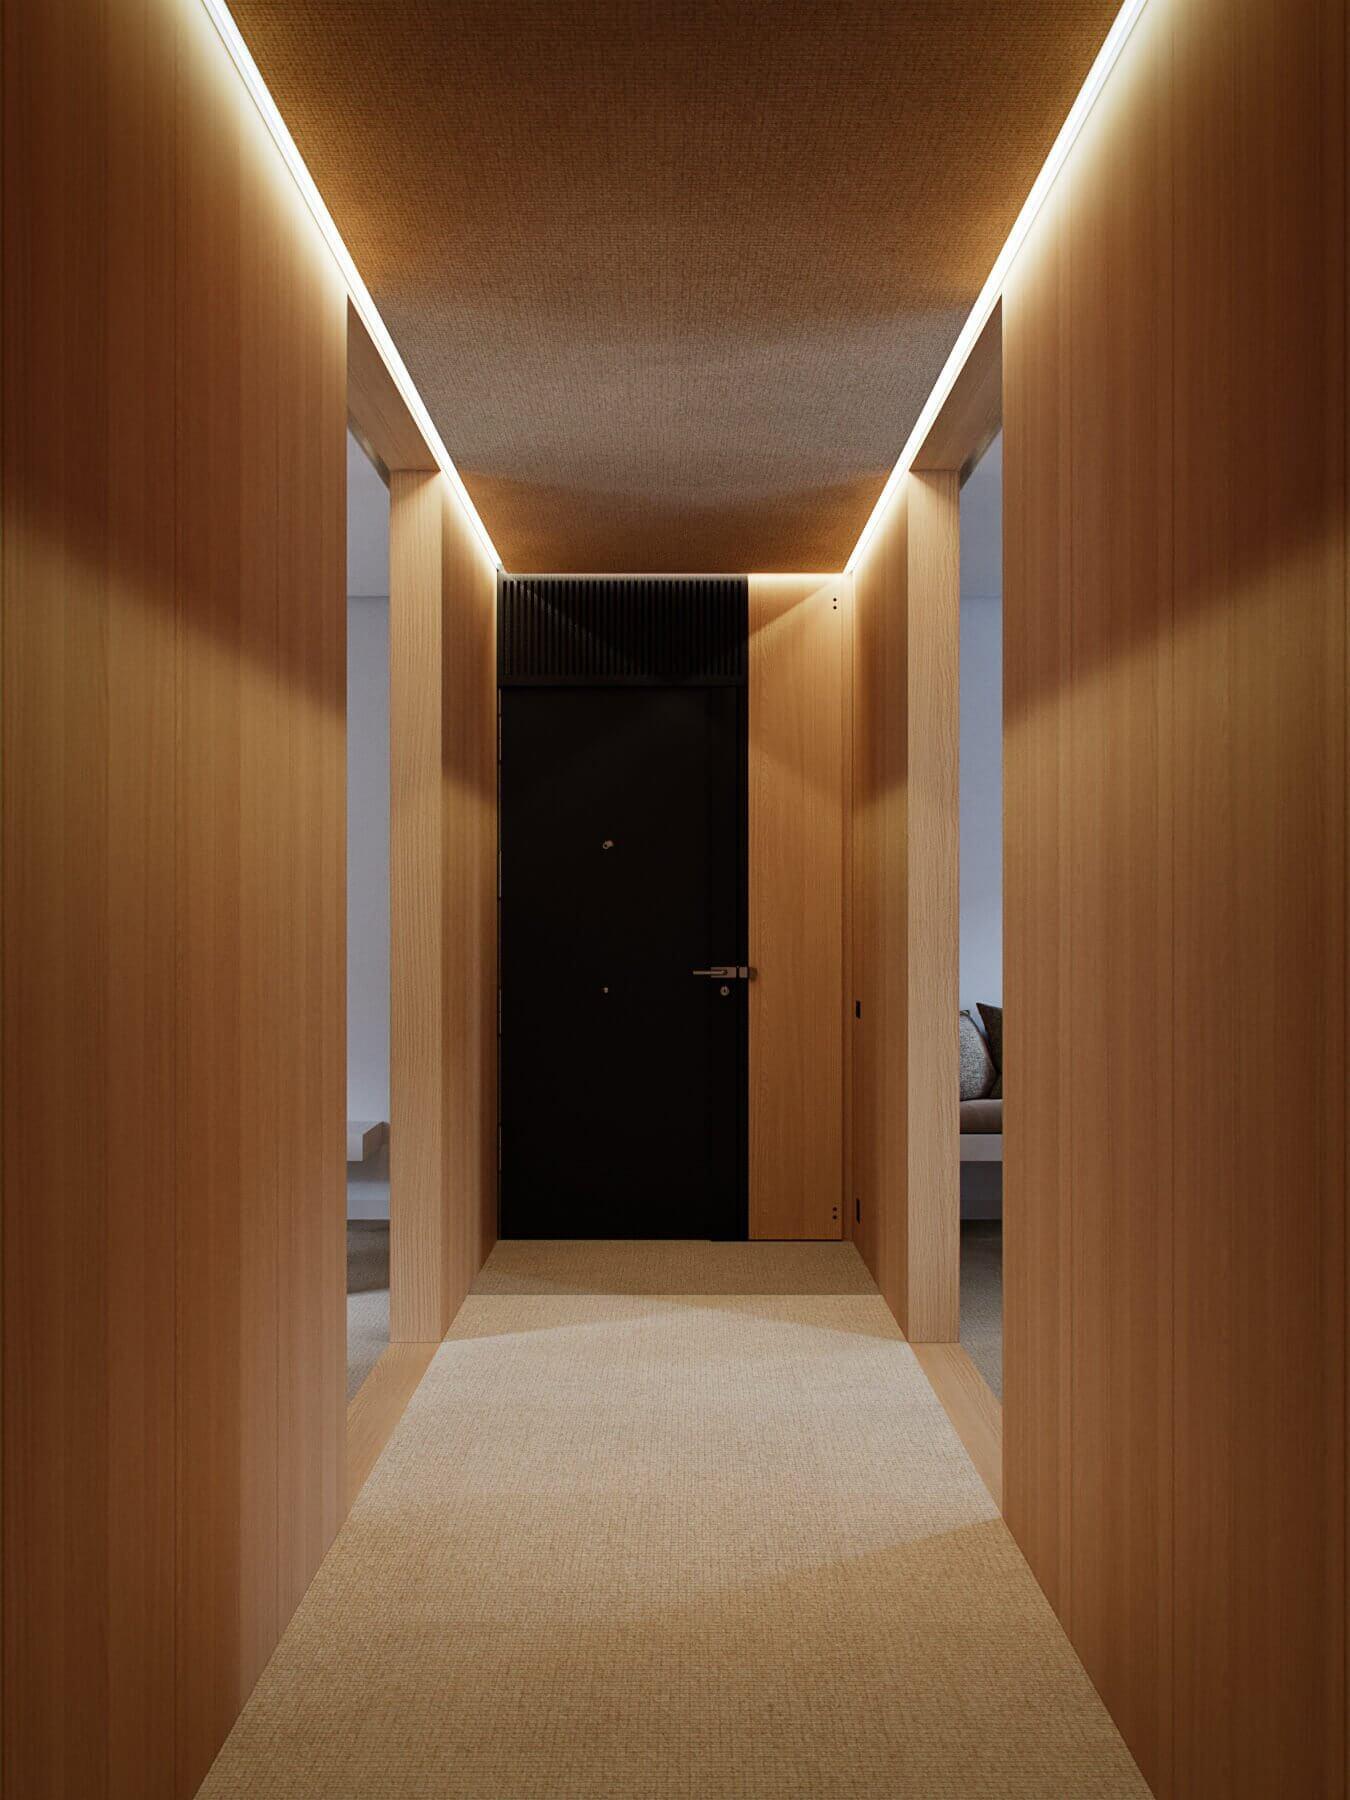 Trendy Living & Kitchen apartment entrance area - cgi visualization